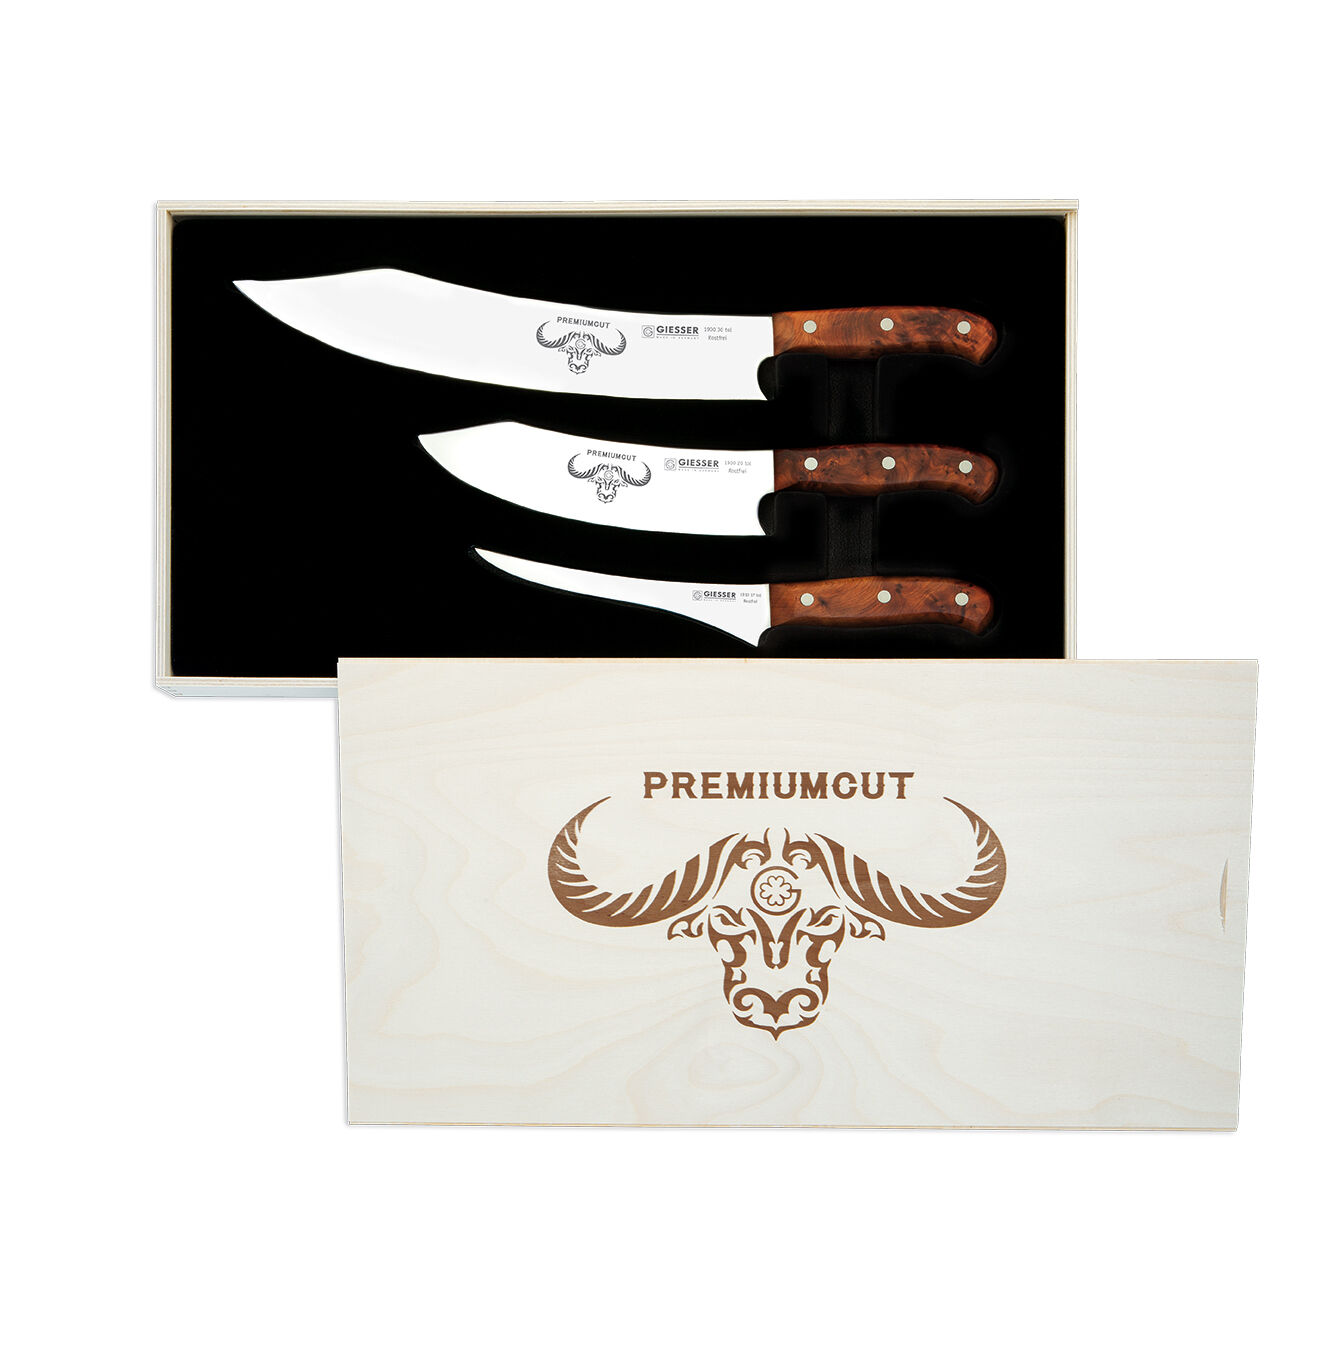 Bilité couteau premiumcut Tree of Life Thuja 3er Set Exclusif Box 1999-3tol